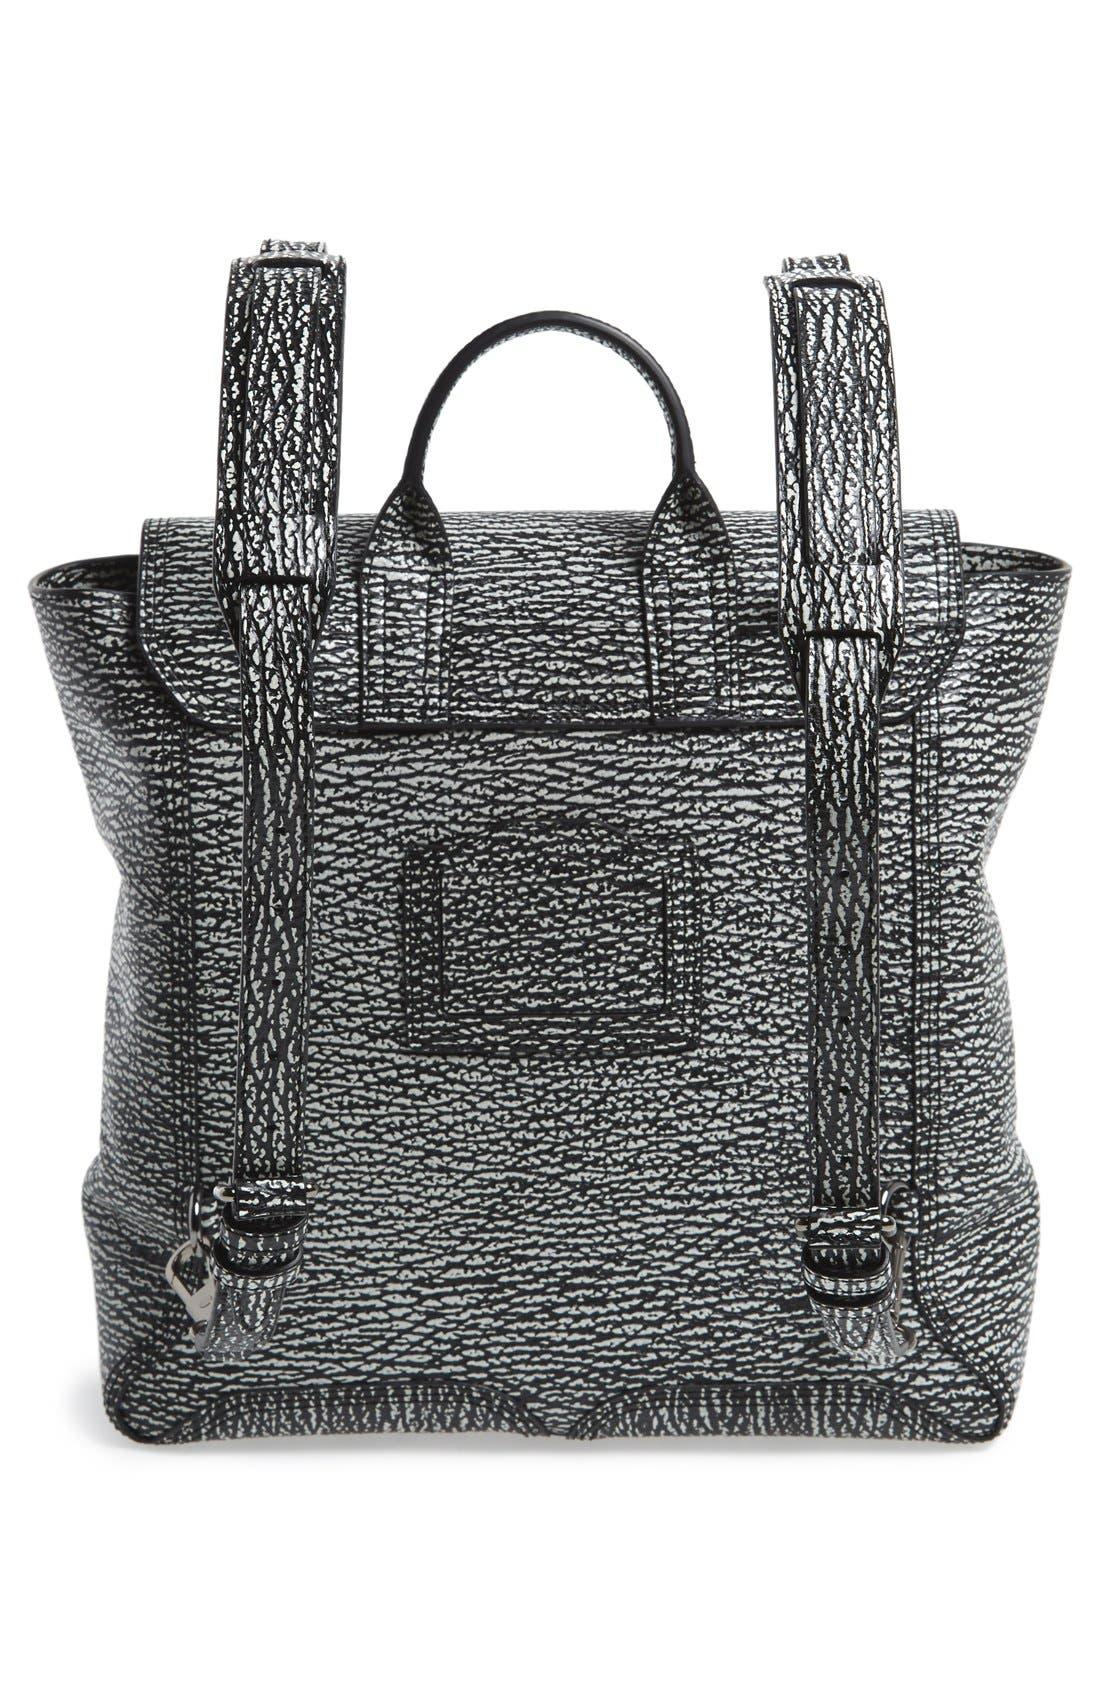 Alternate Image 3  - 3.1 Phillip Lim 'Pashli' Shark Embossed Leather Backpack